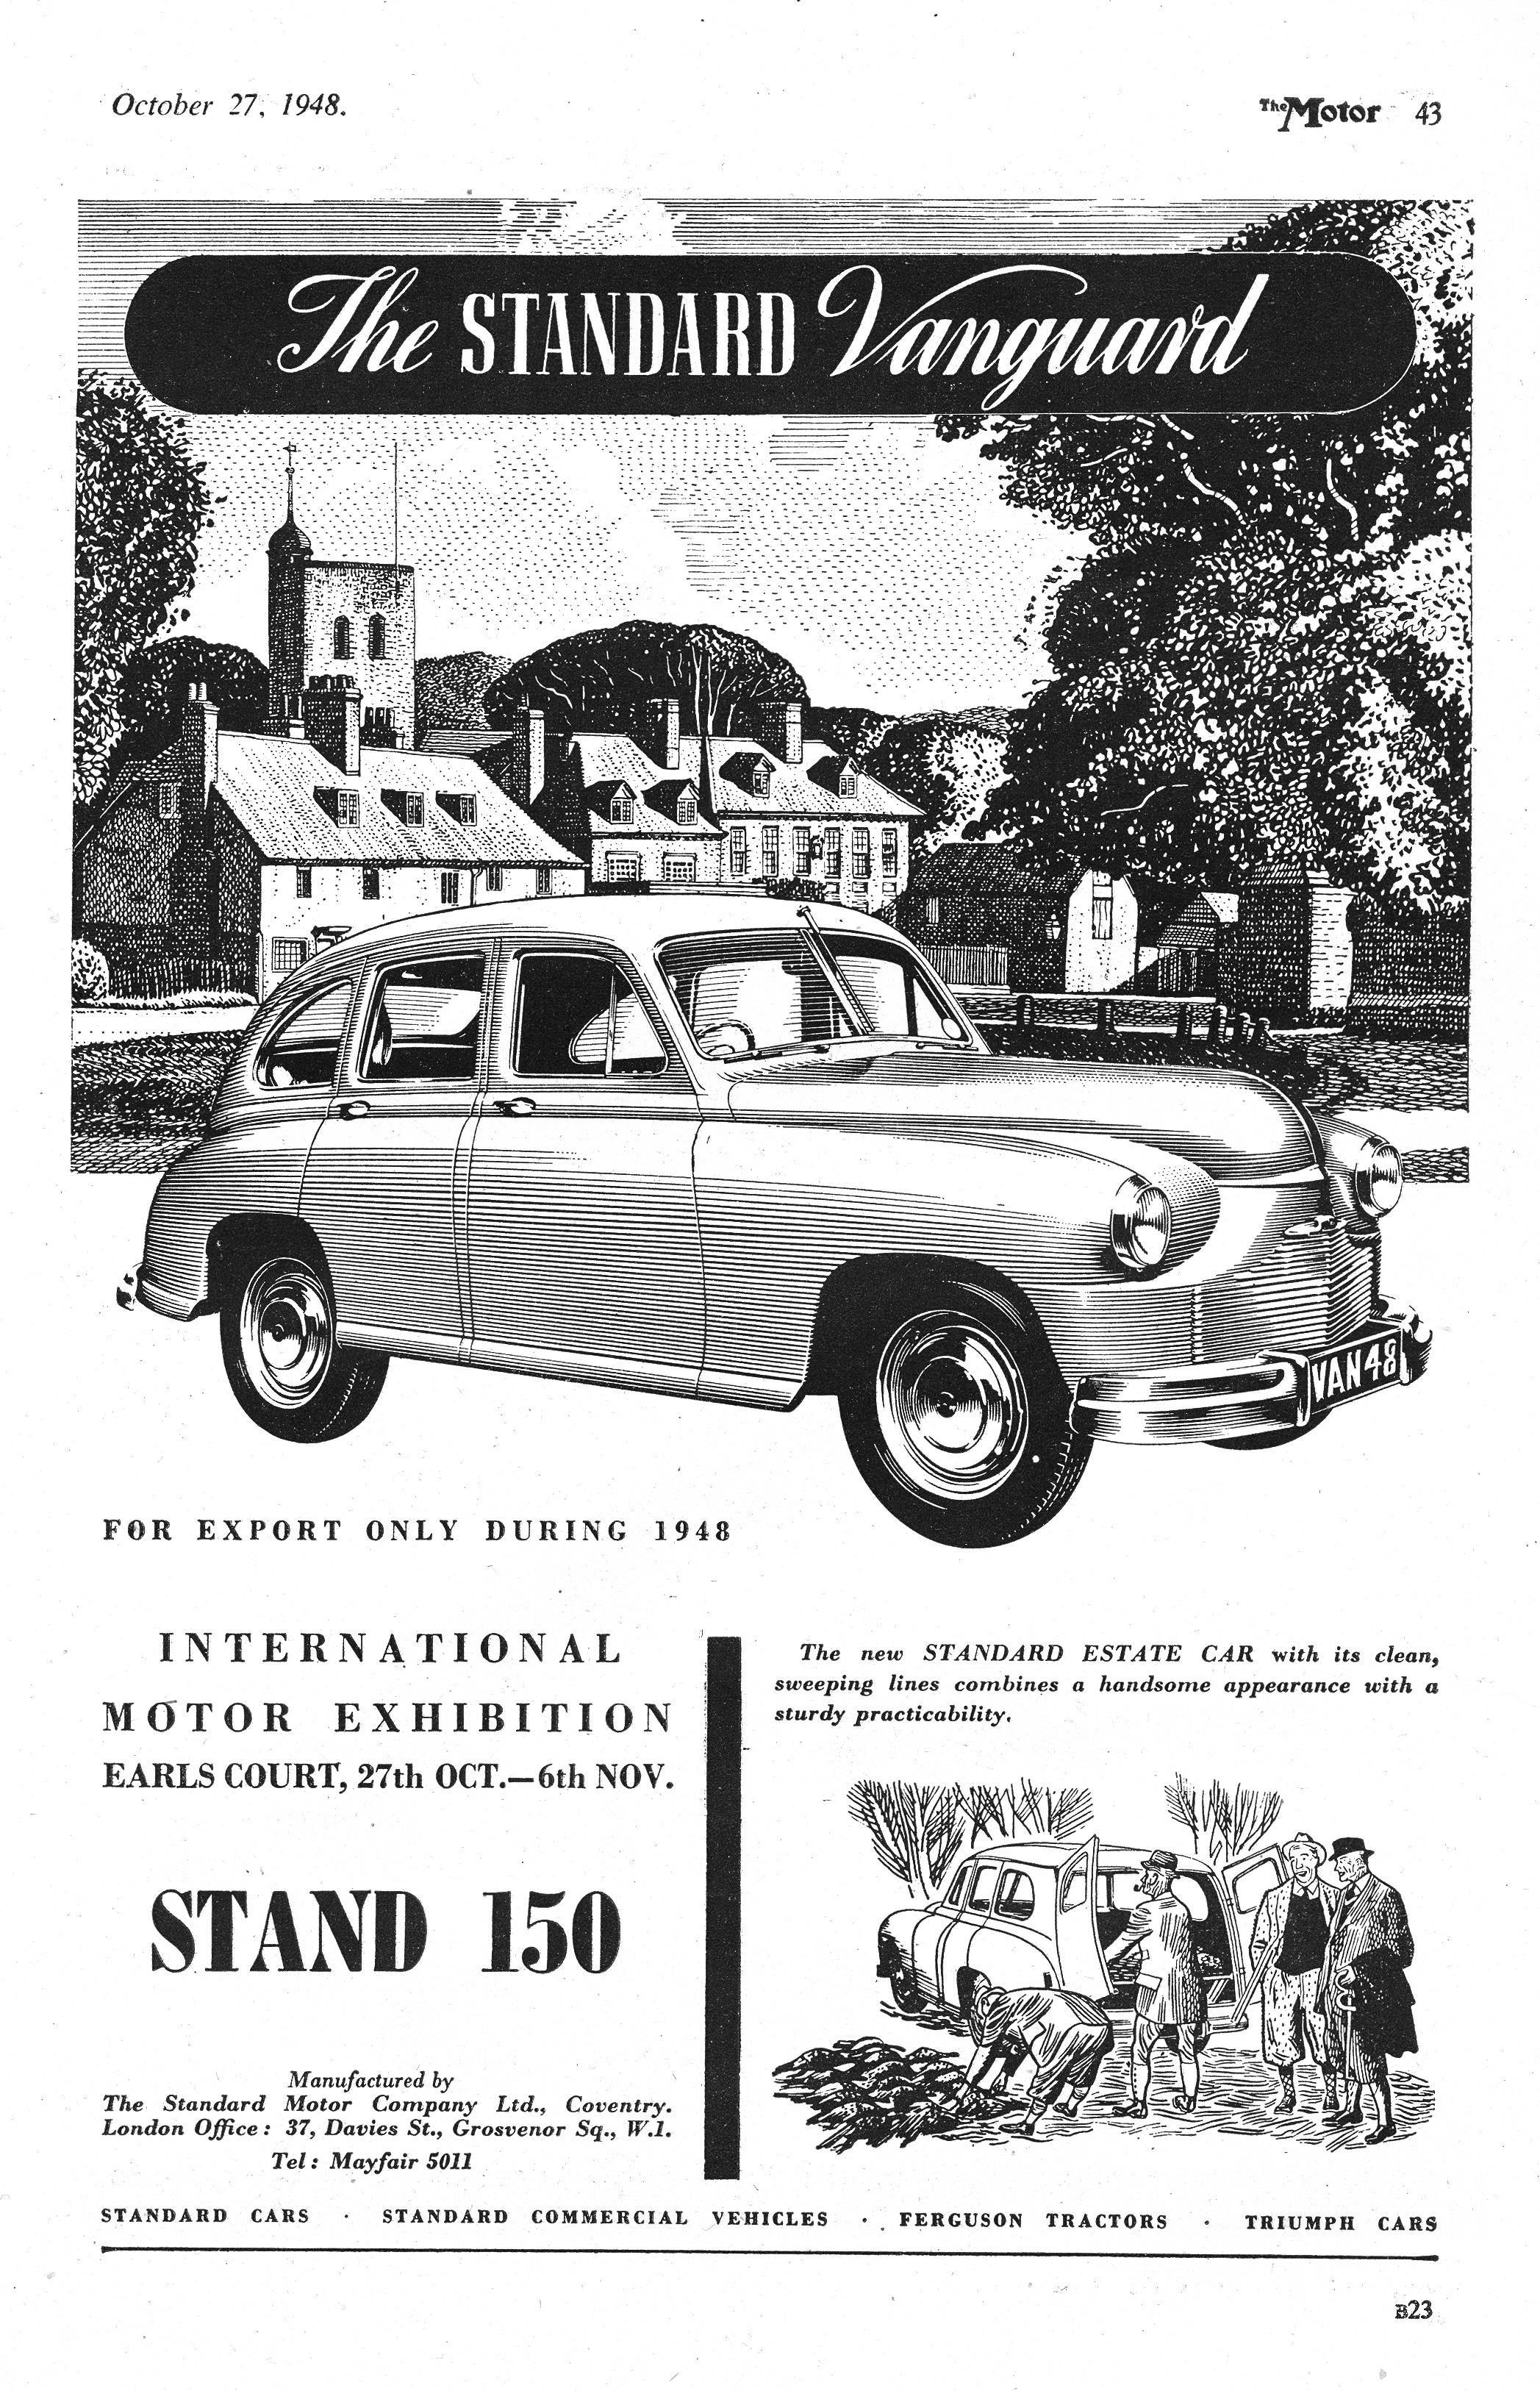 vanguard motor cars | Caferacersjpg.com